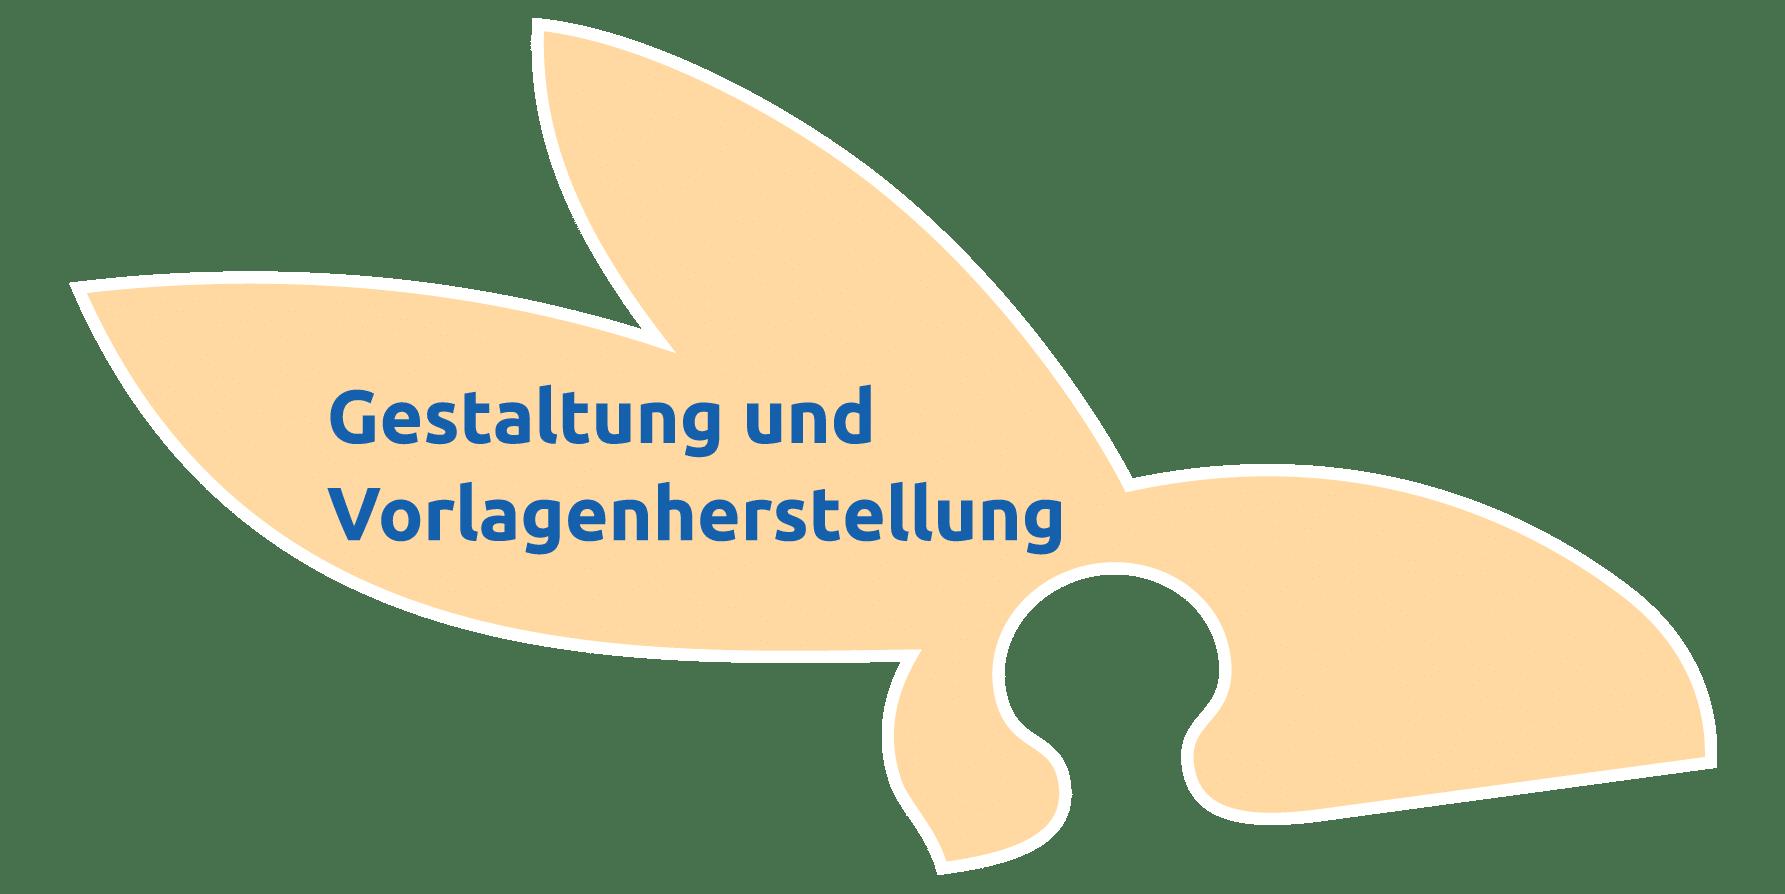 Druckpunkt Muri - Heller Media AG / Schumacher Druckerei AG